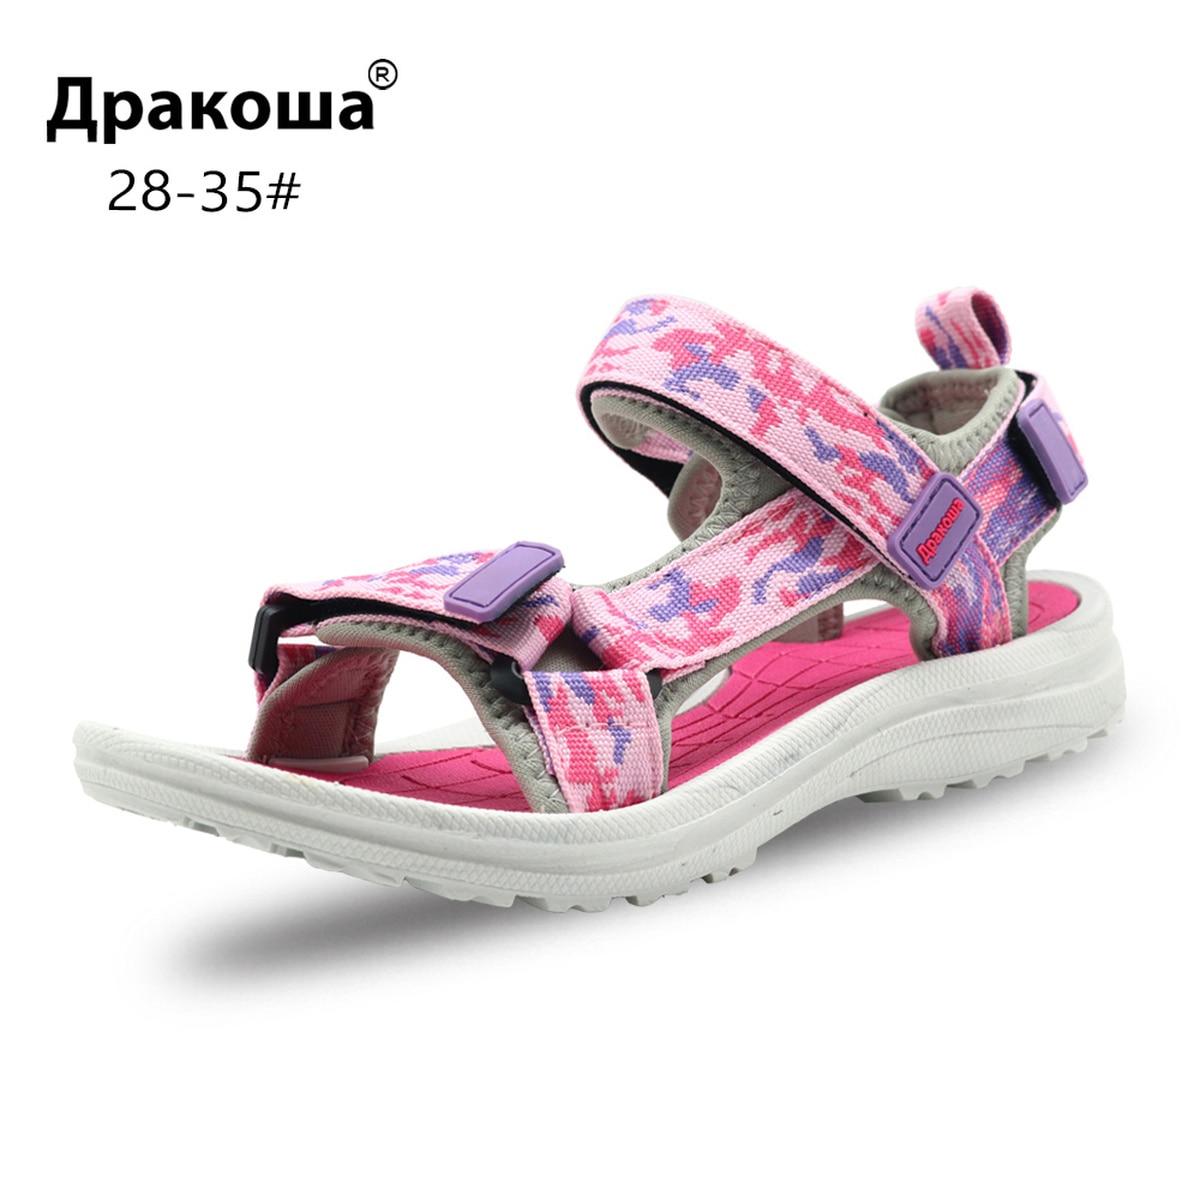 Apakowa Summer Sandals Open Toe Wedge Heel Girl Sandals Hook&Loop Quick Dry Toddler Beach Sandals For Children's Shoes